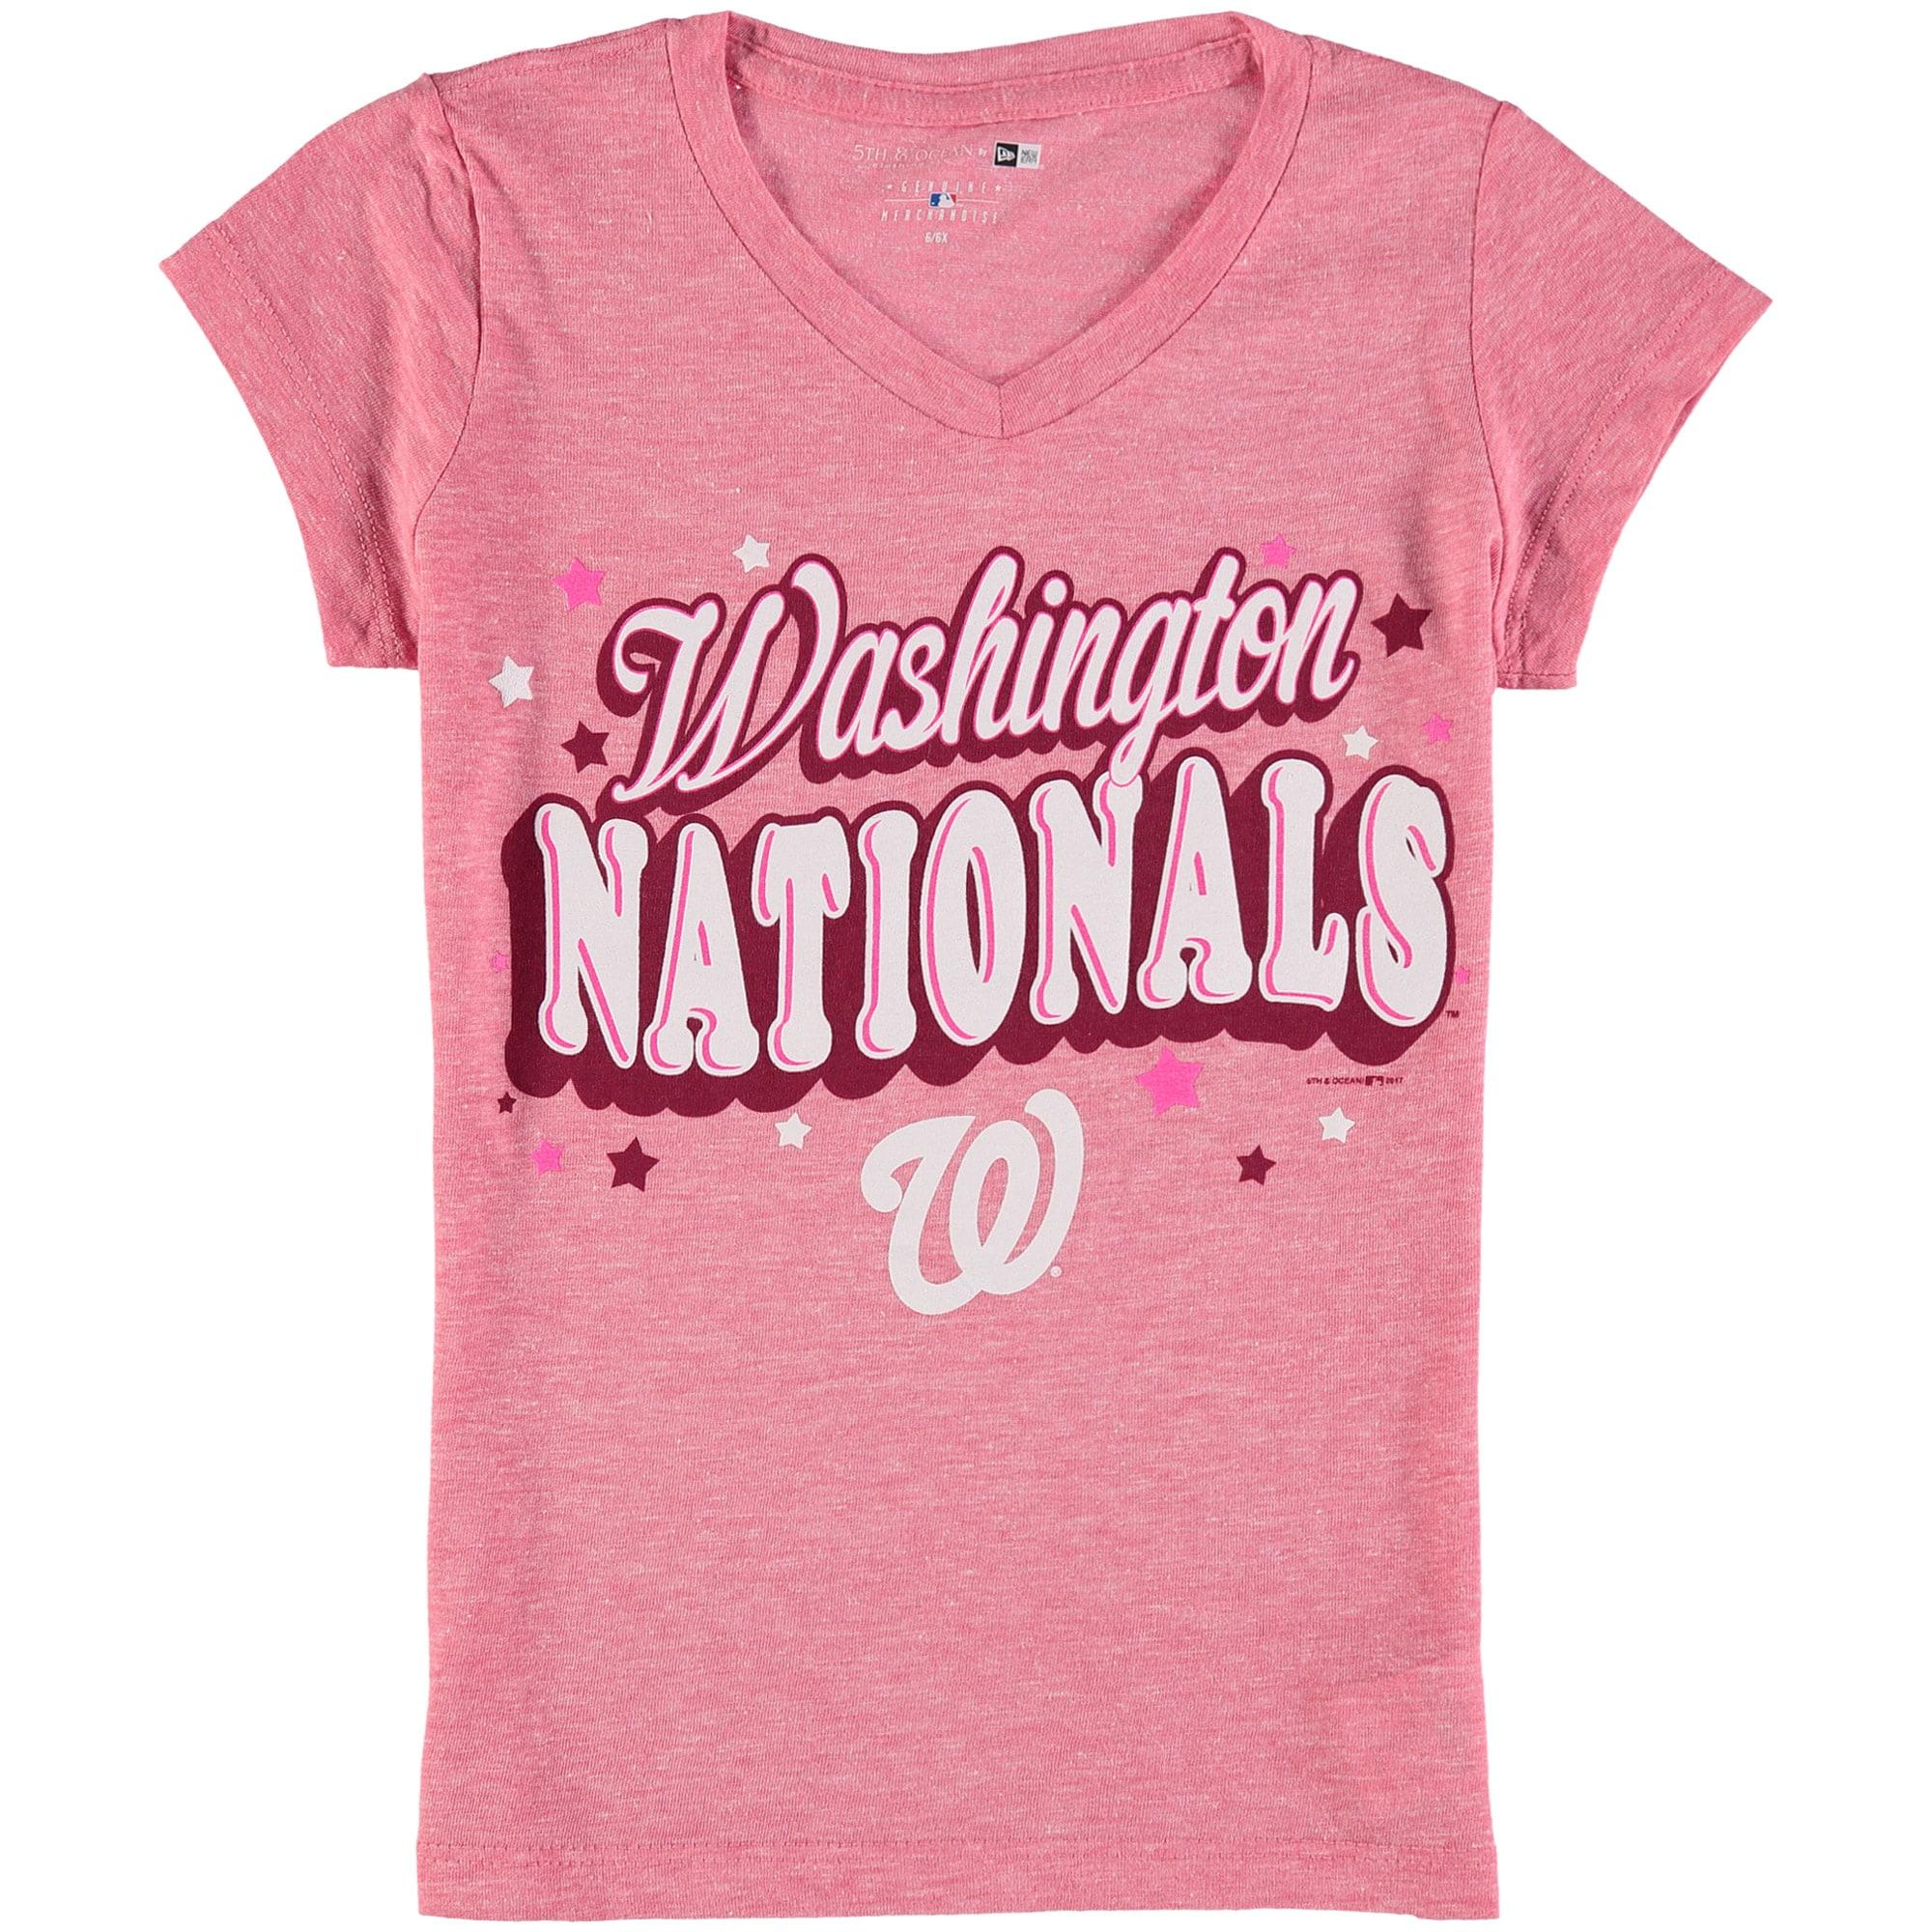 Washington Nationals 5th & Ocean by New Era Girls Youth Stars Tri-Blend V-Neck T-Shirt - Pink